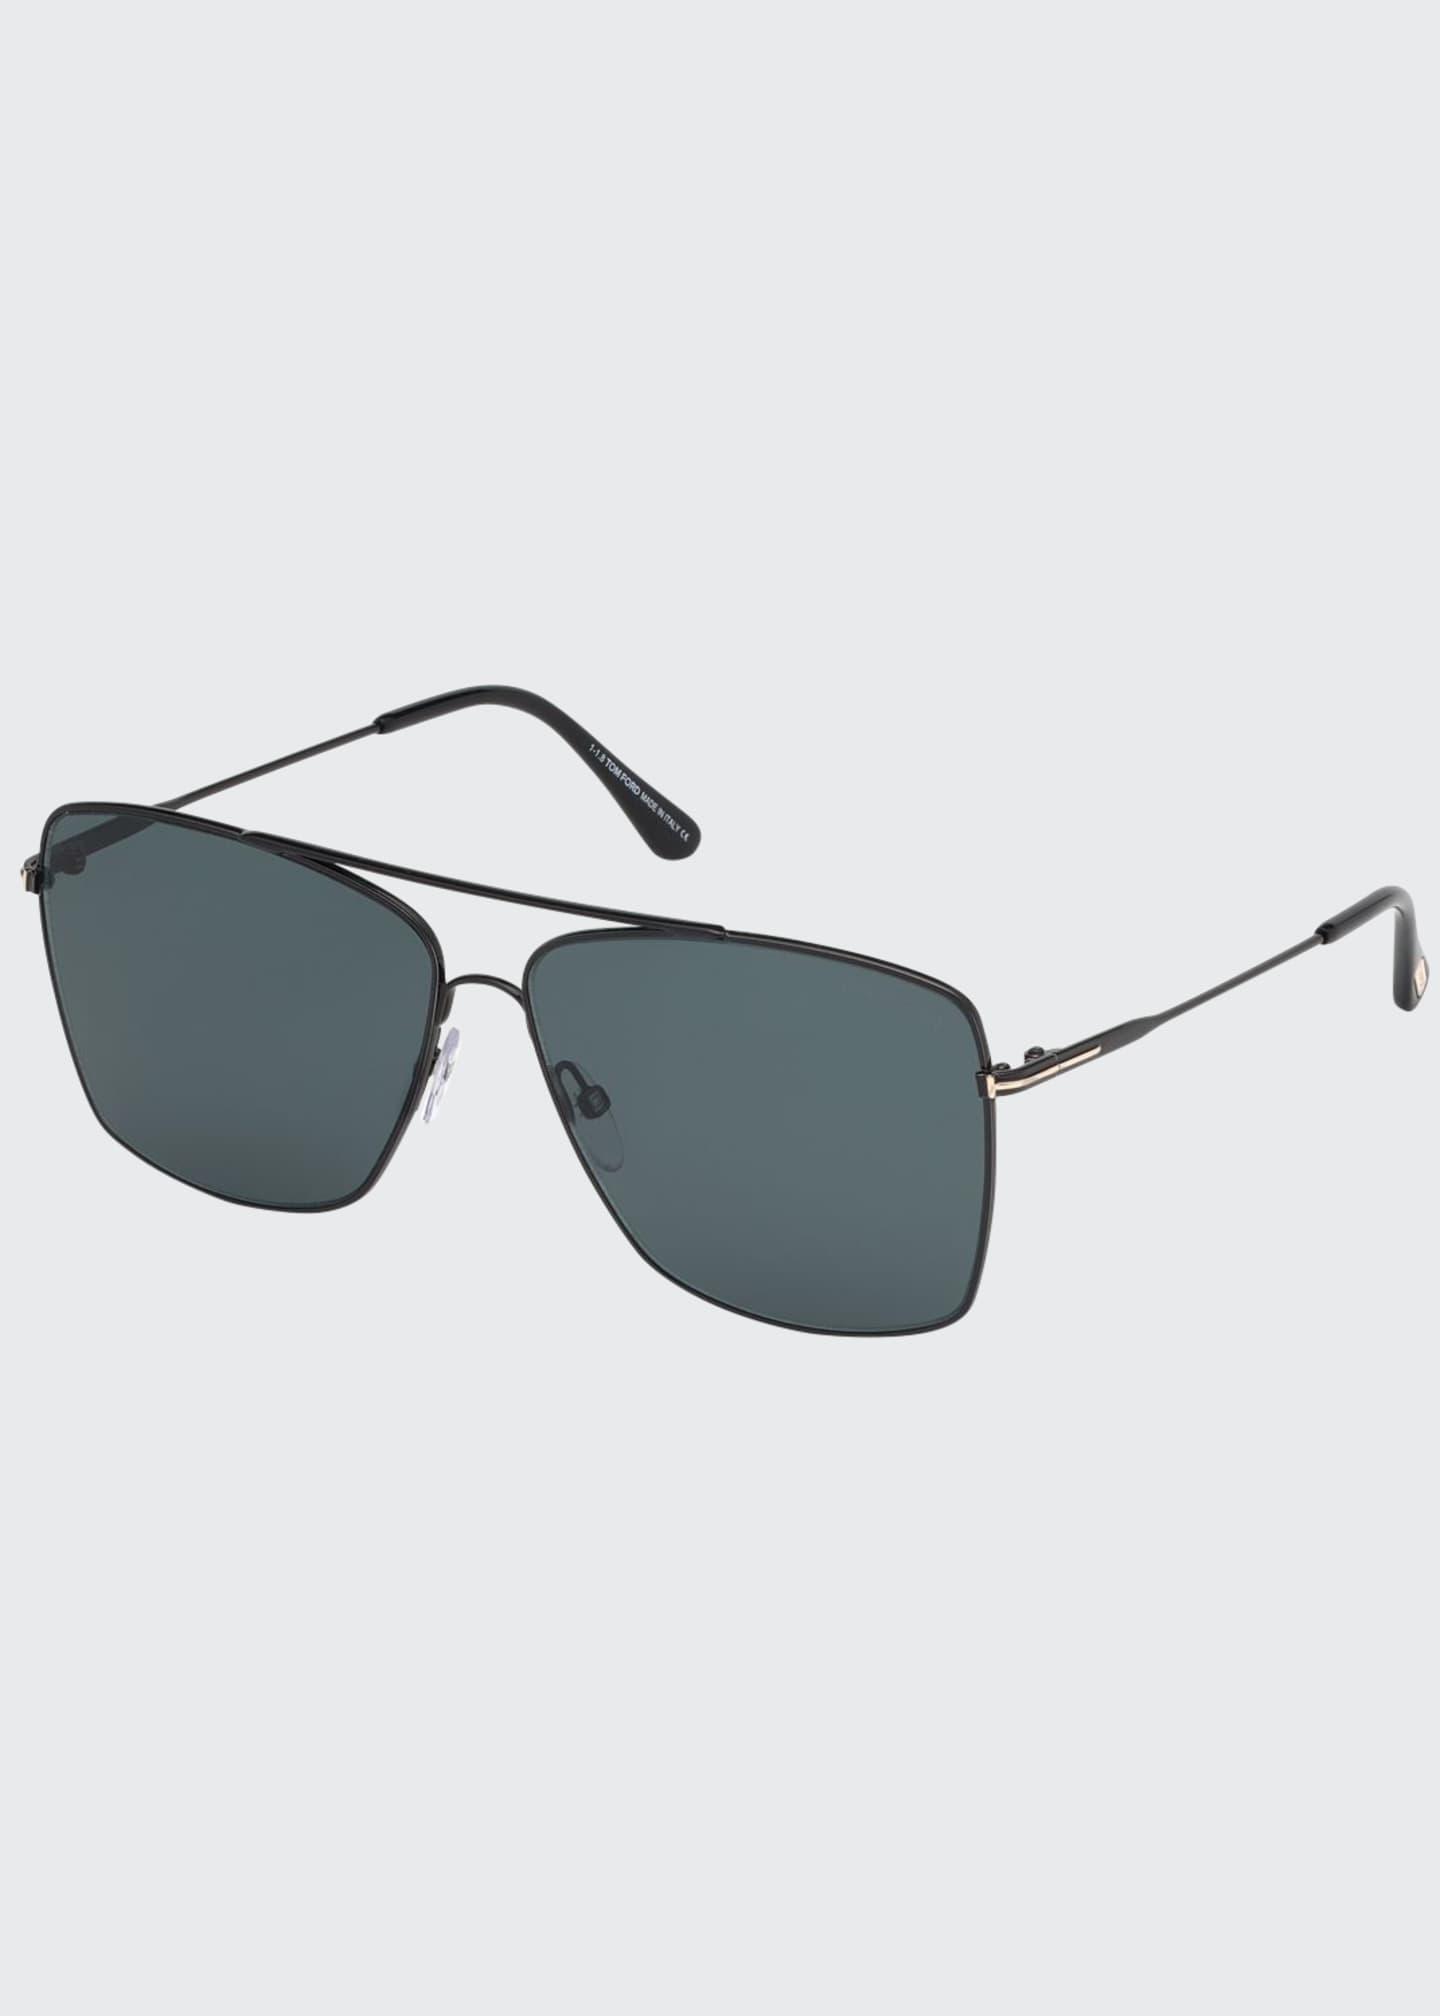 TOM FORD Men's Magnus Gunmetal Sunglasses